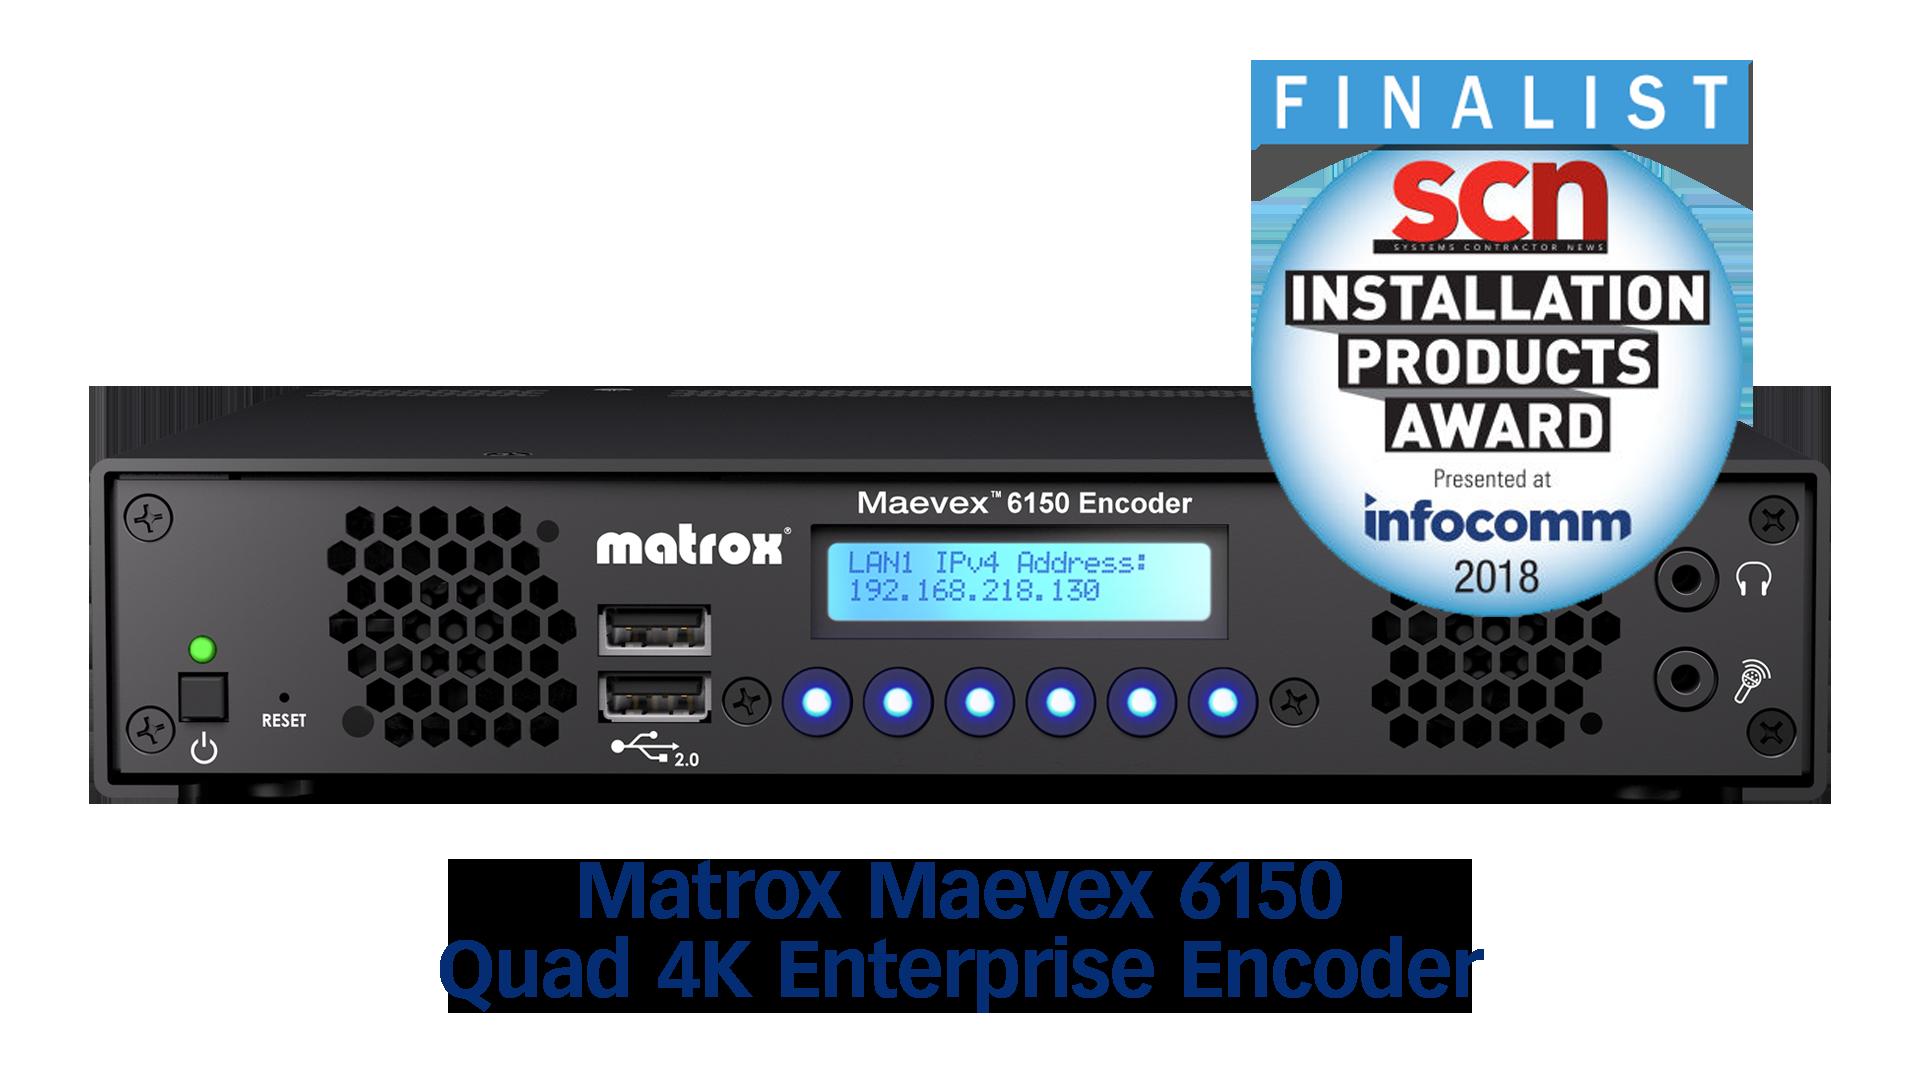 Matrox Maevex 6150 Quad 4K Enterprise Encoder Finalist